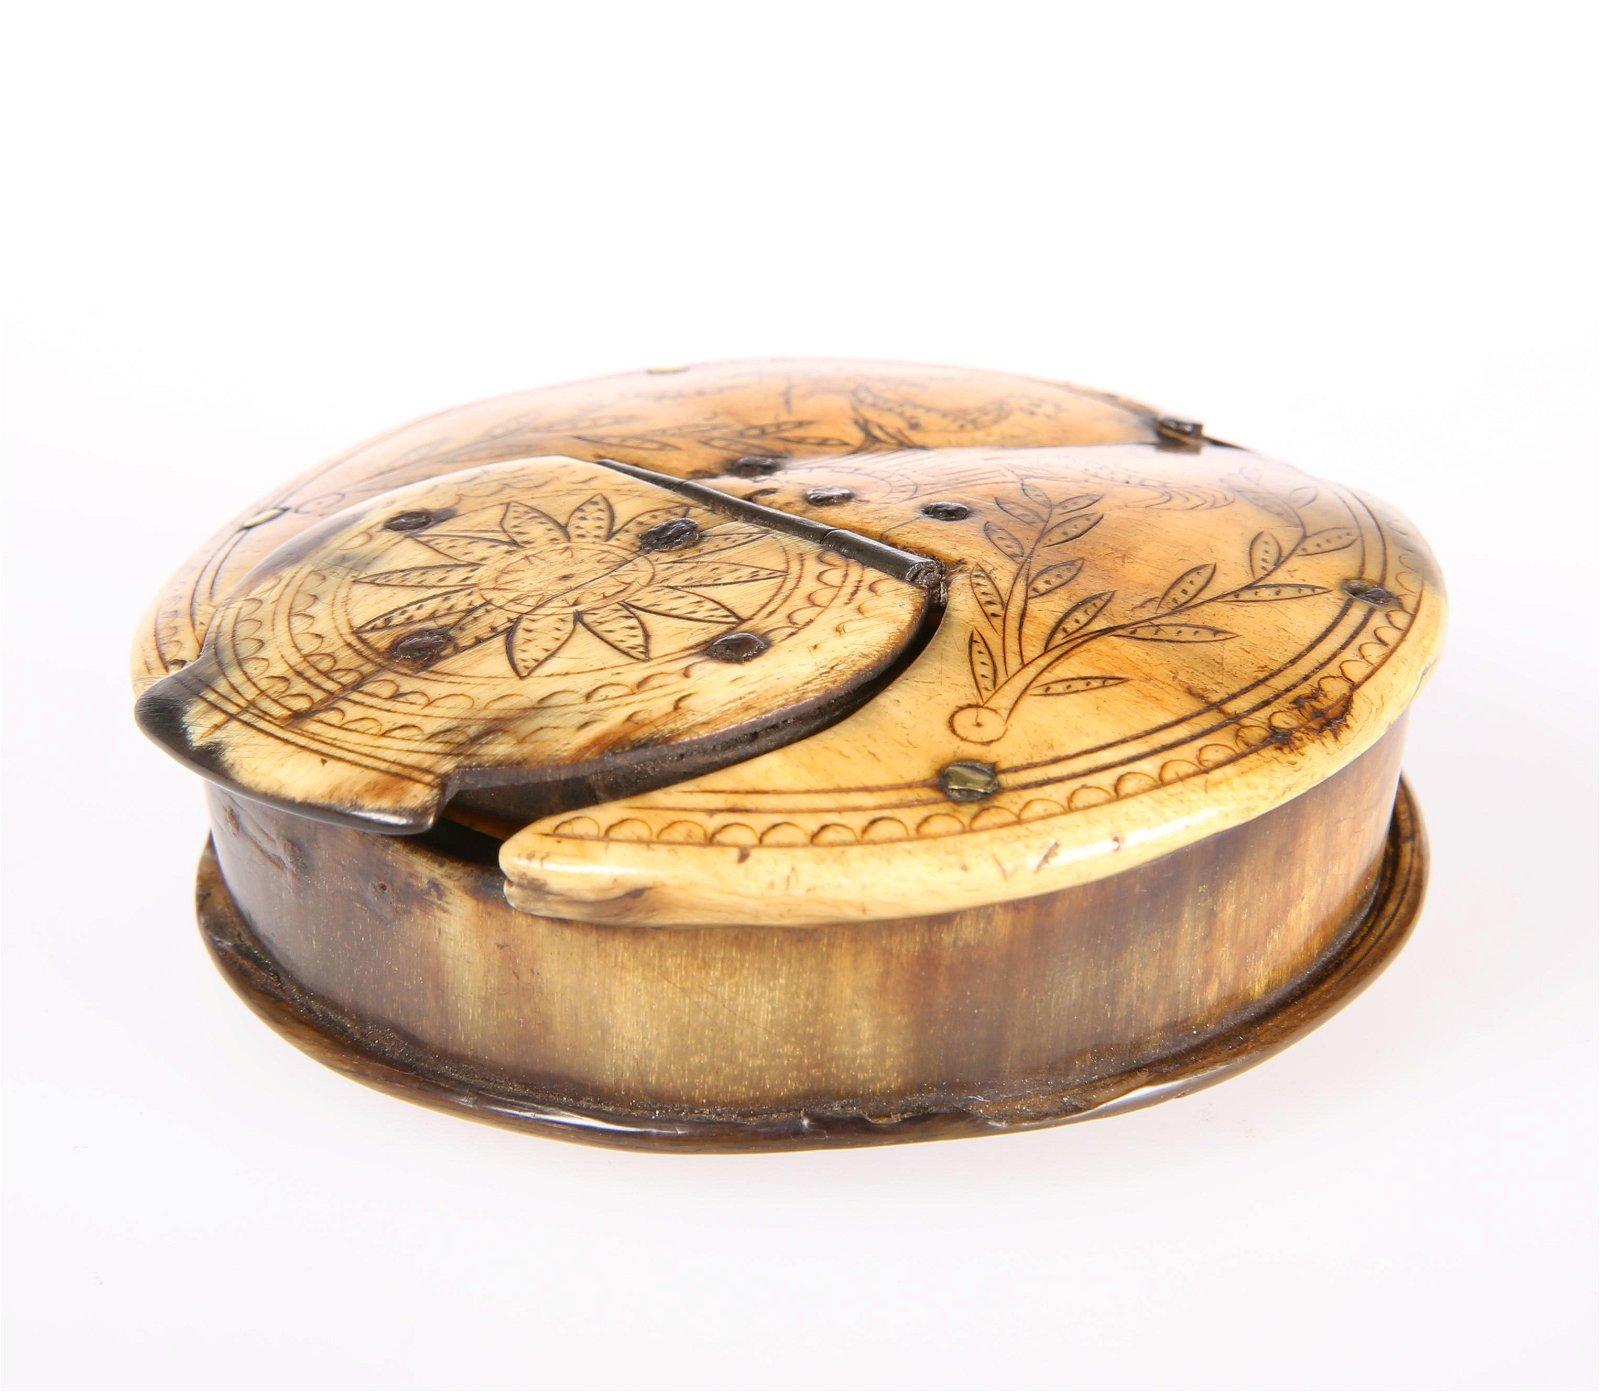 AN EARLY 19TH CENTURY HORN SNUFF BOX, circular,